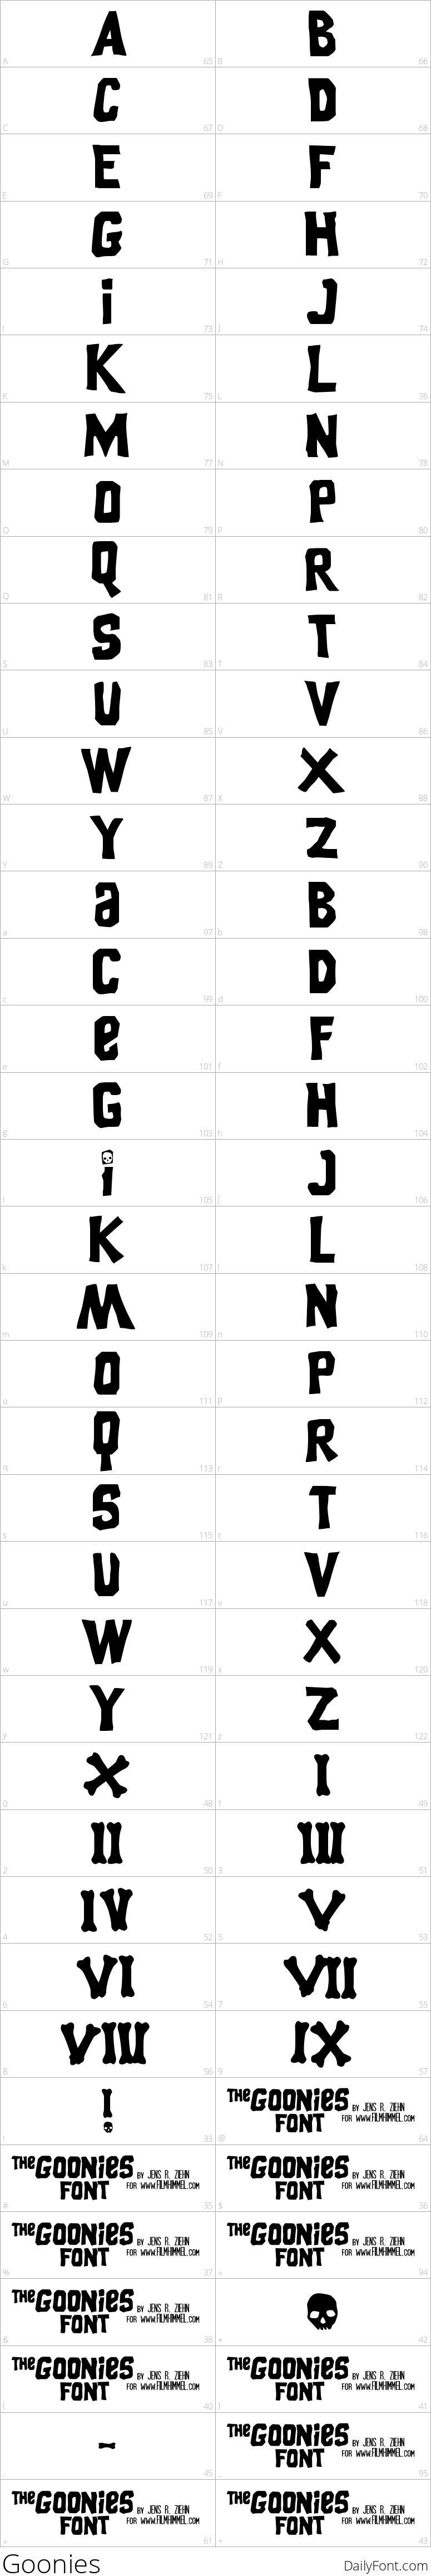 Goonies character map